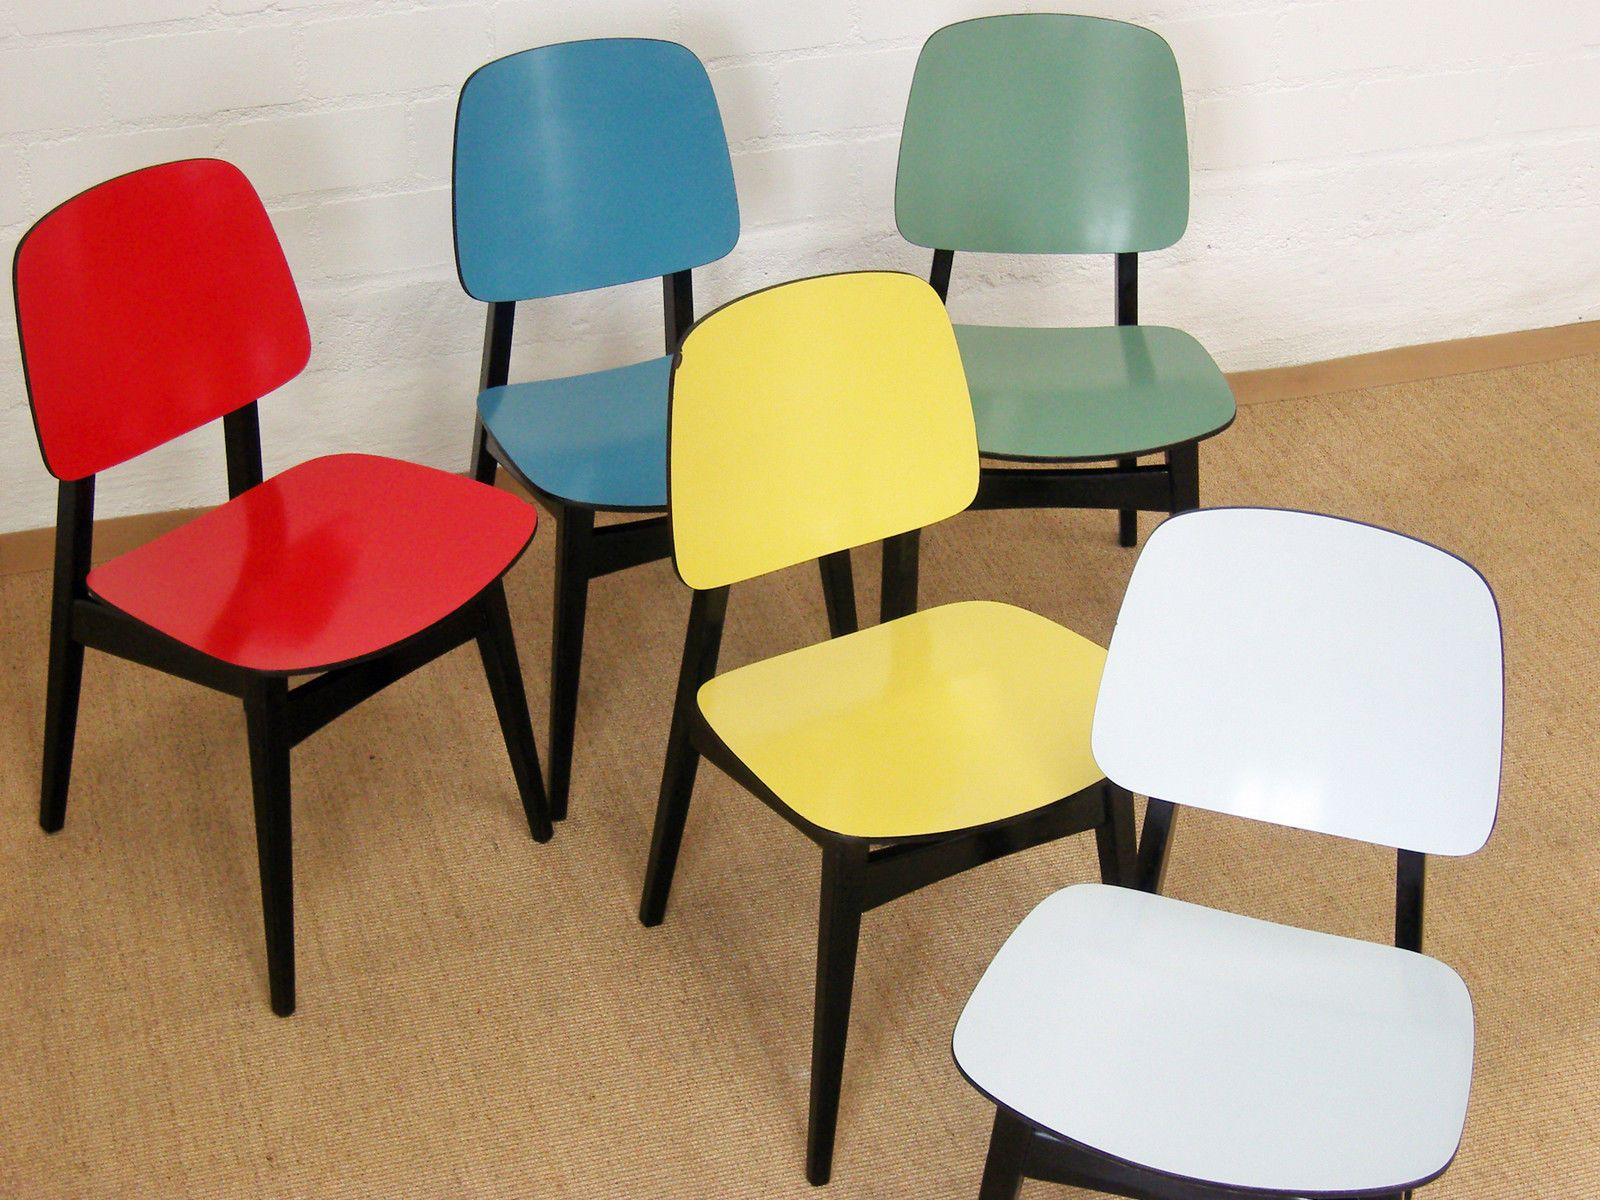 Lübke stuhl blau chair chaise 1 4 stühle dining chair 50er 60er